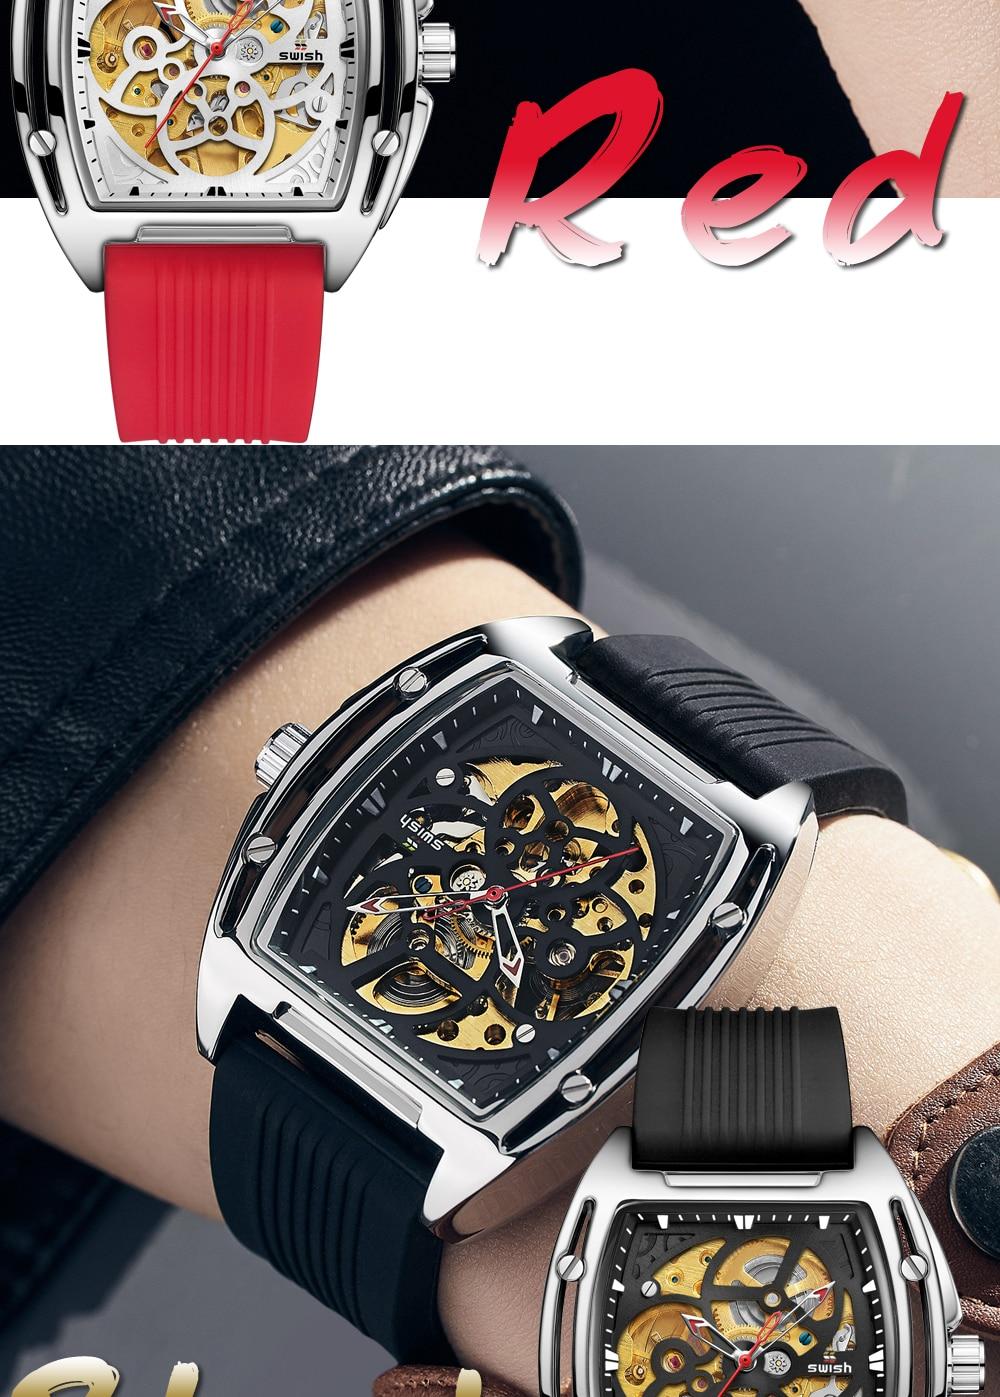 Hfb3abc8ff5da4015878f77355e0c02cfM SWISH Brand Design Luxury Men's Mechanical Wristwatch